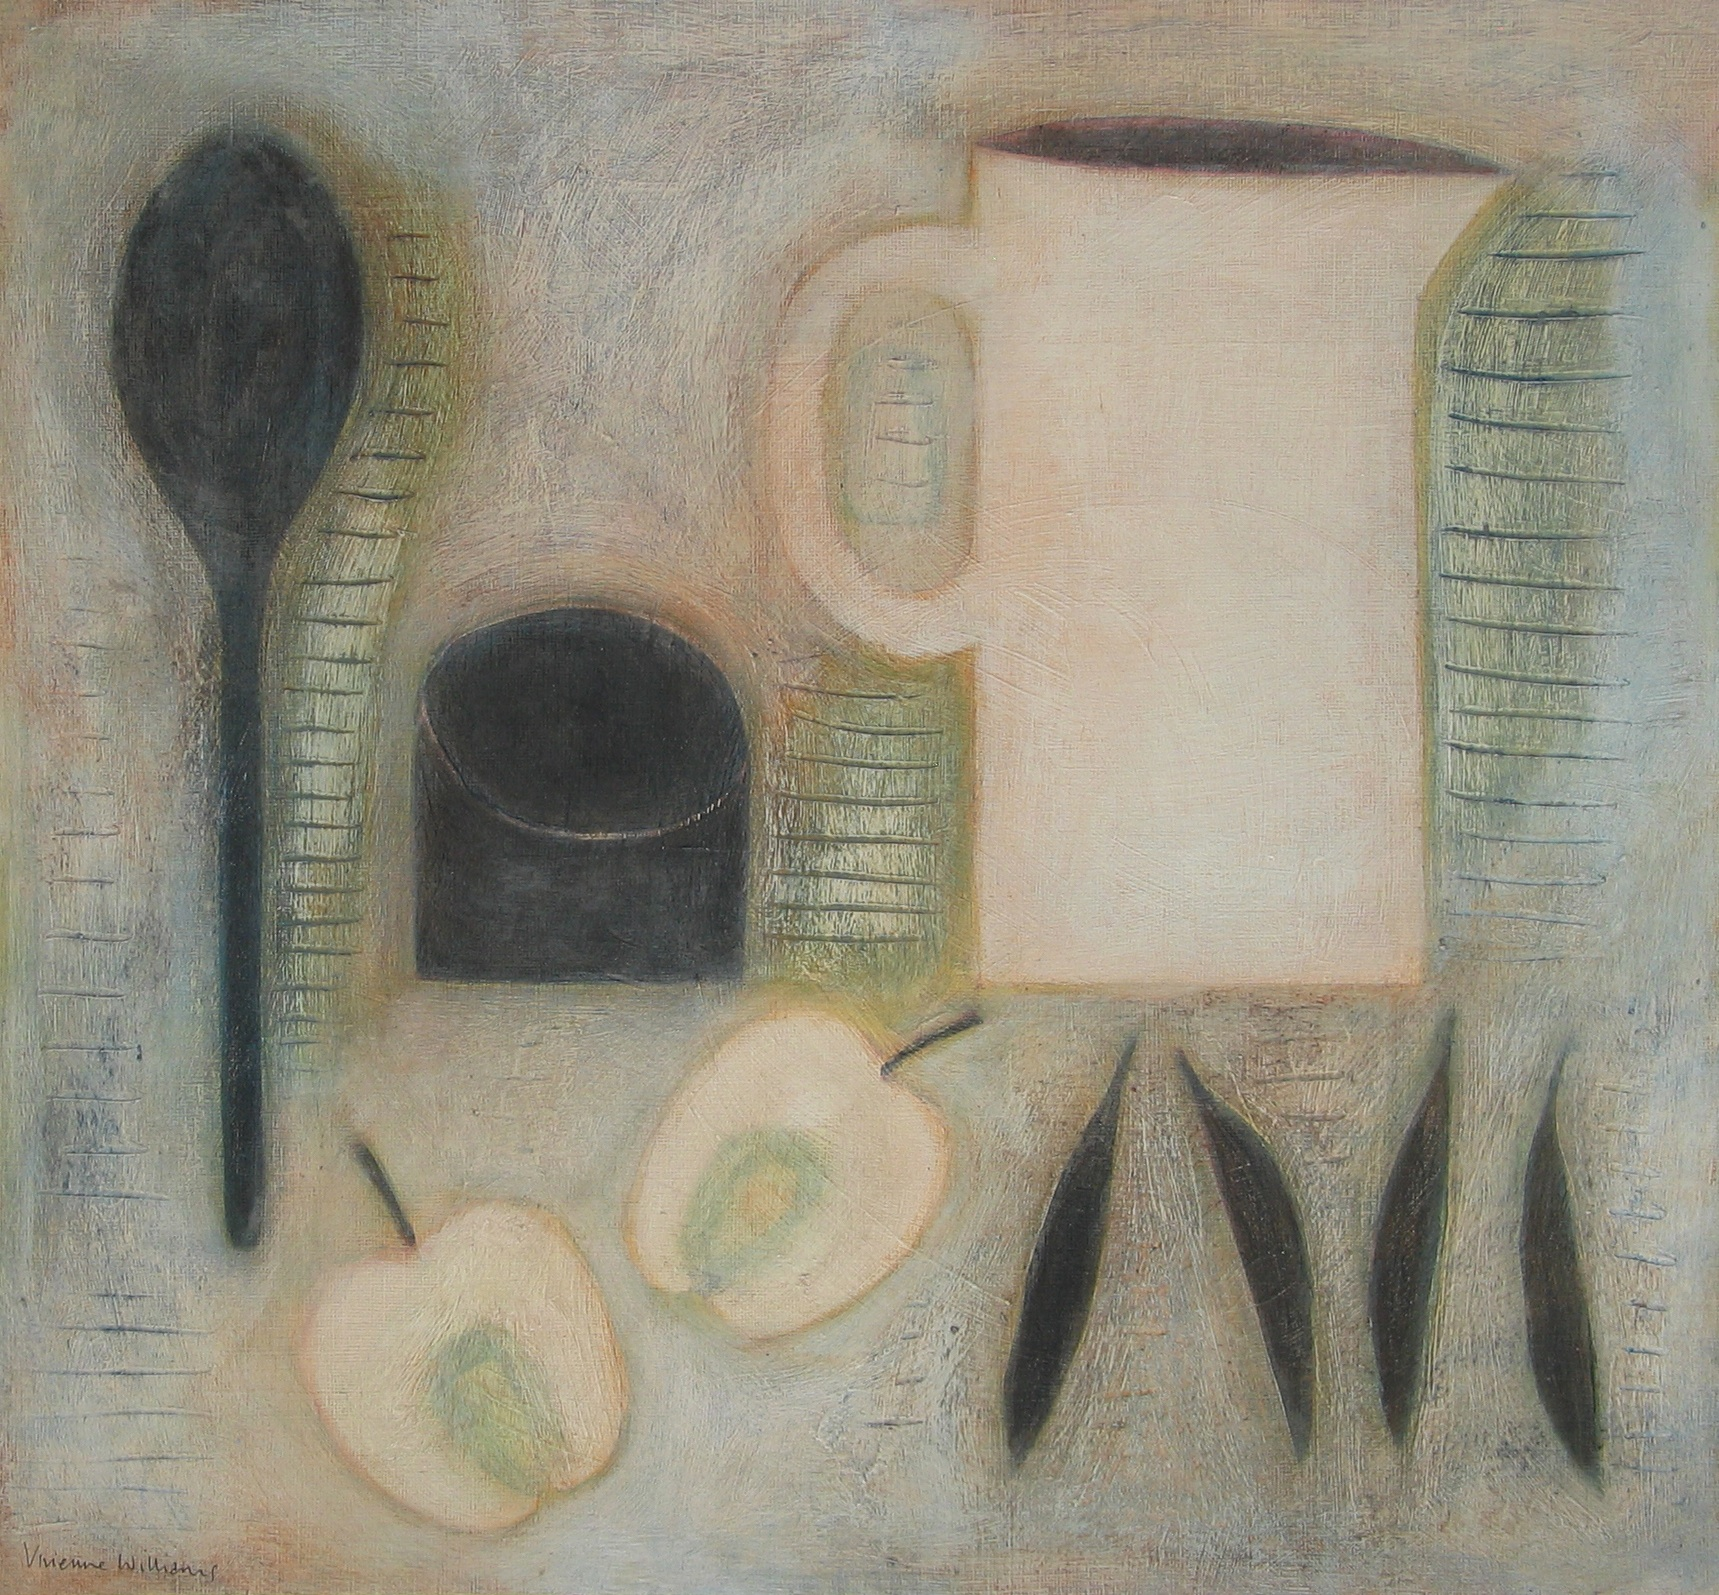 Jug, Apple, Peas and Spoon, 40.5cm x 43.5cm, 2012